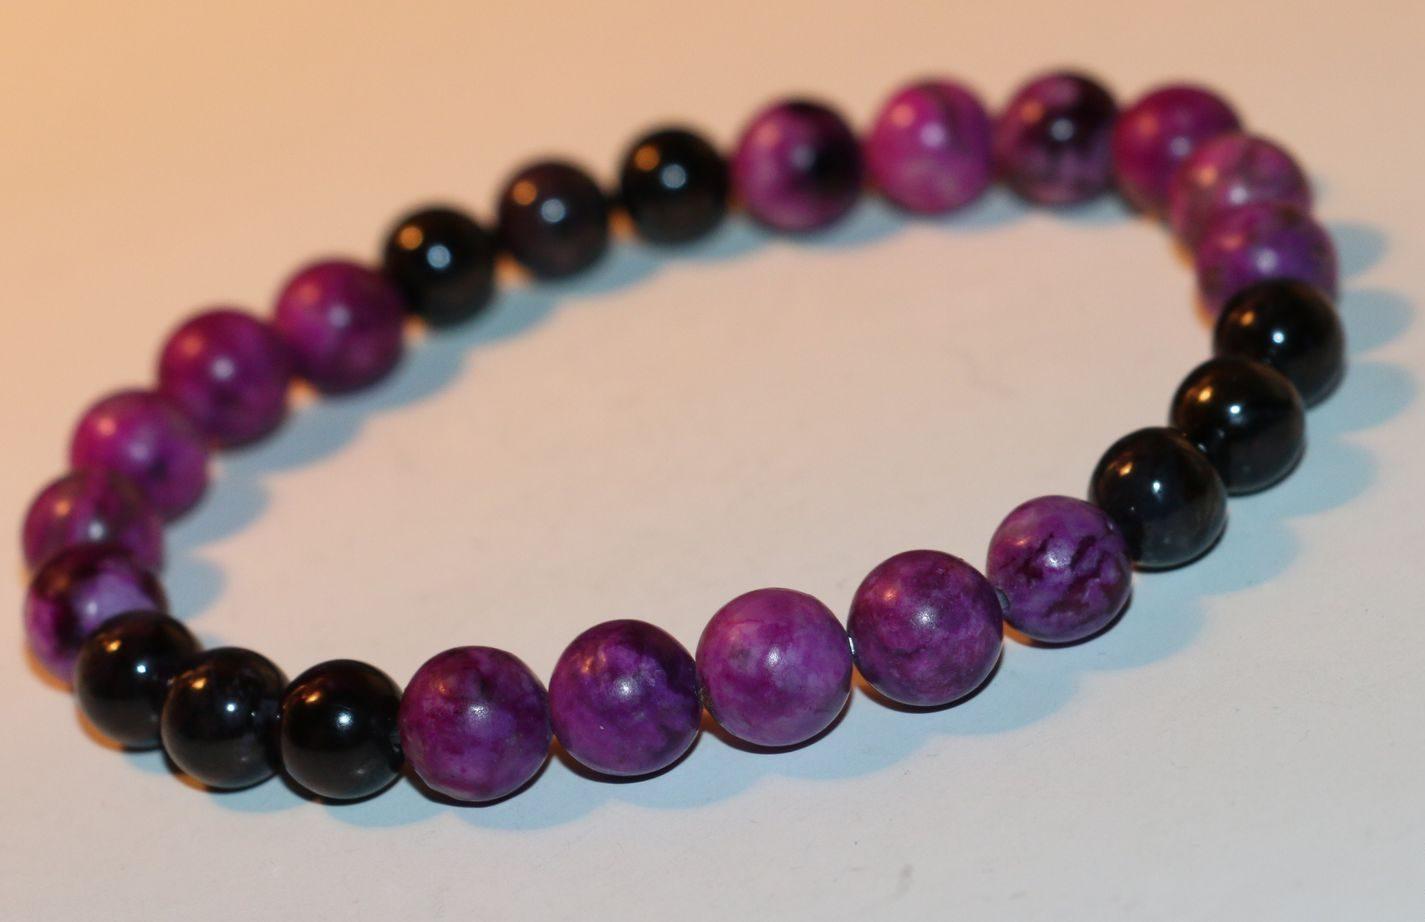 Пурпурная мантия сугилита